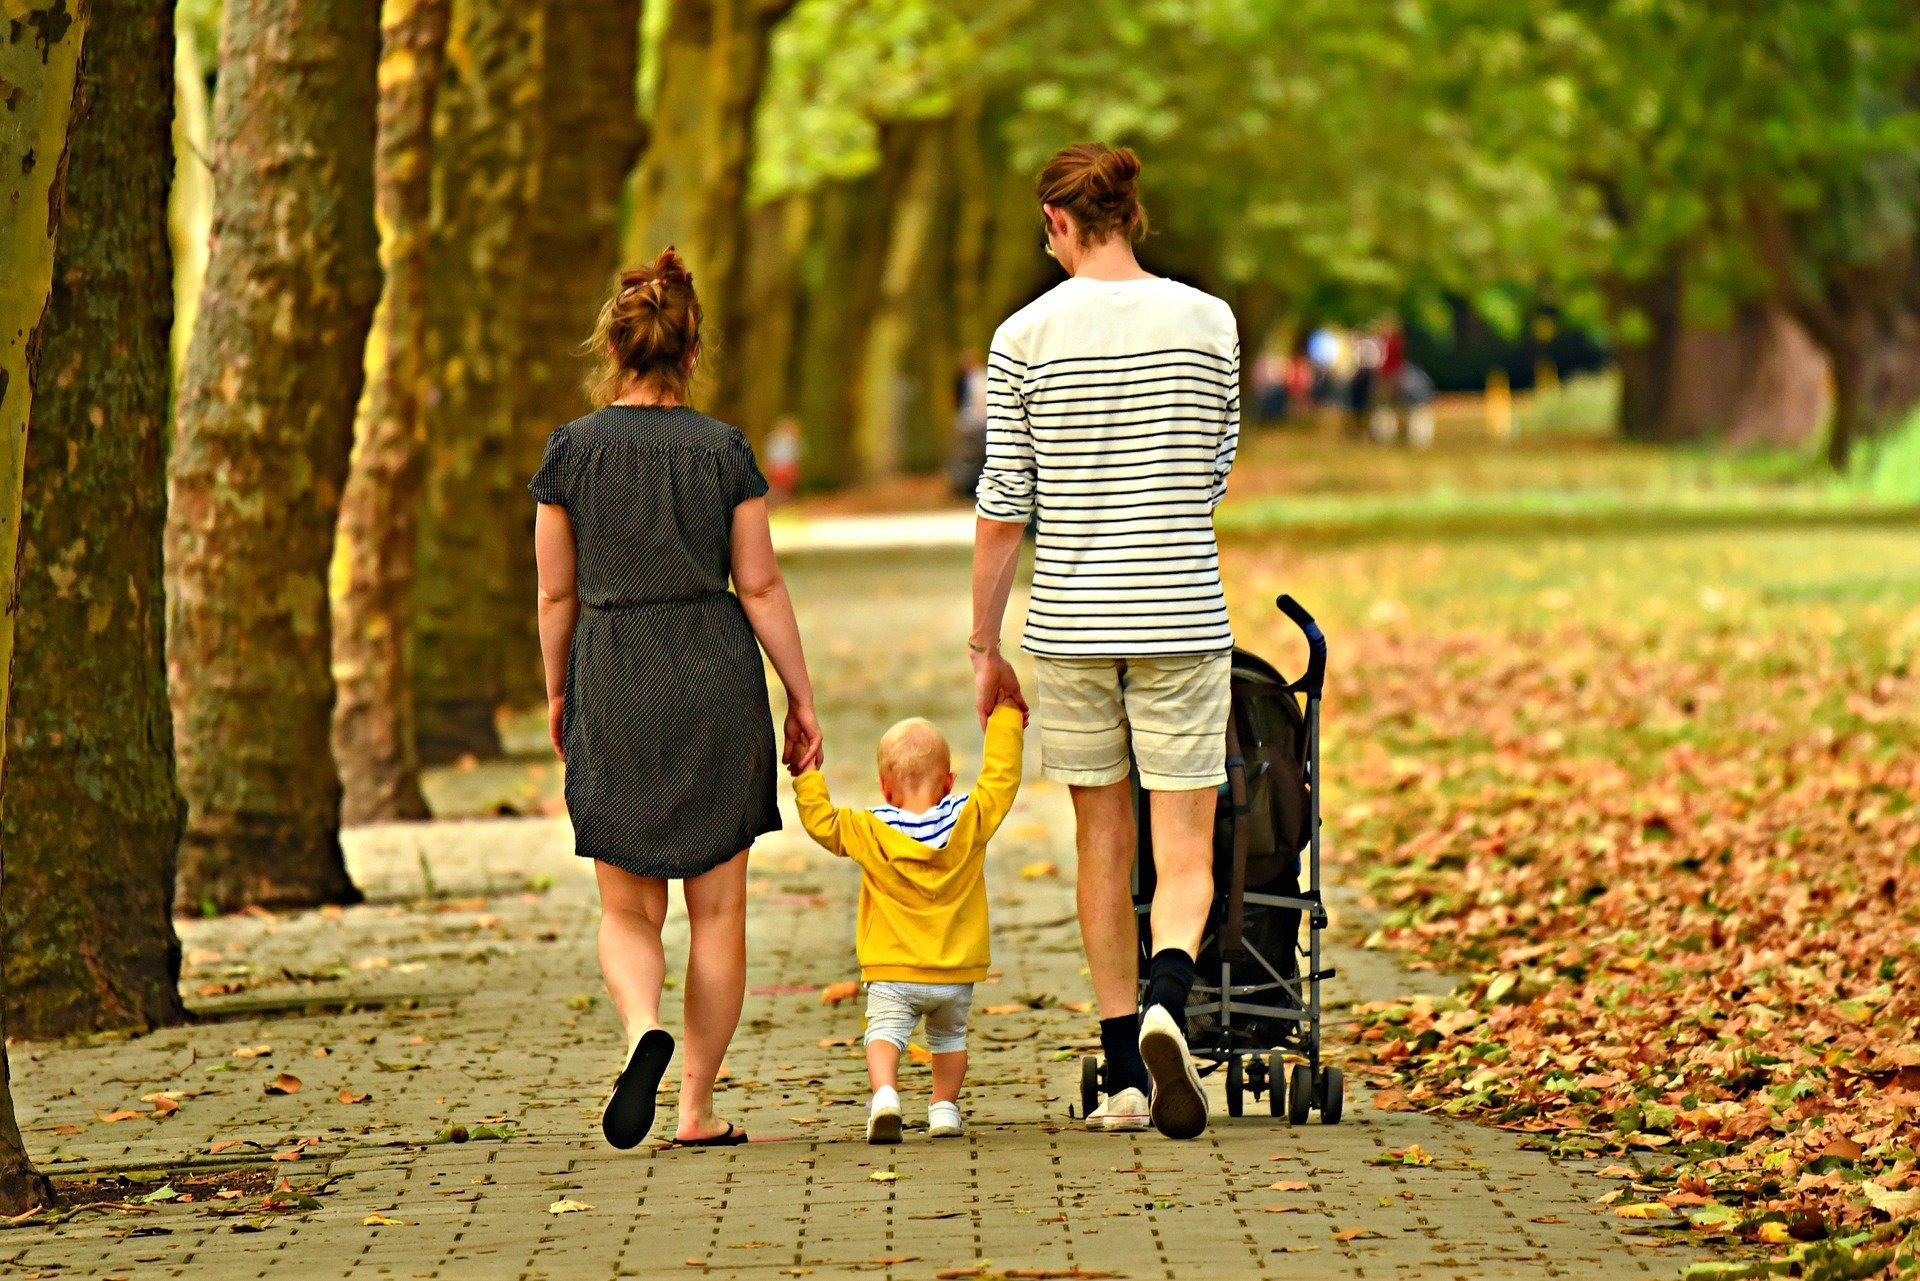 Source: https://pixabay.com/photos/family-love-outdoors-woman-man-3602245/